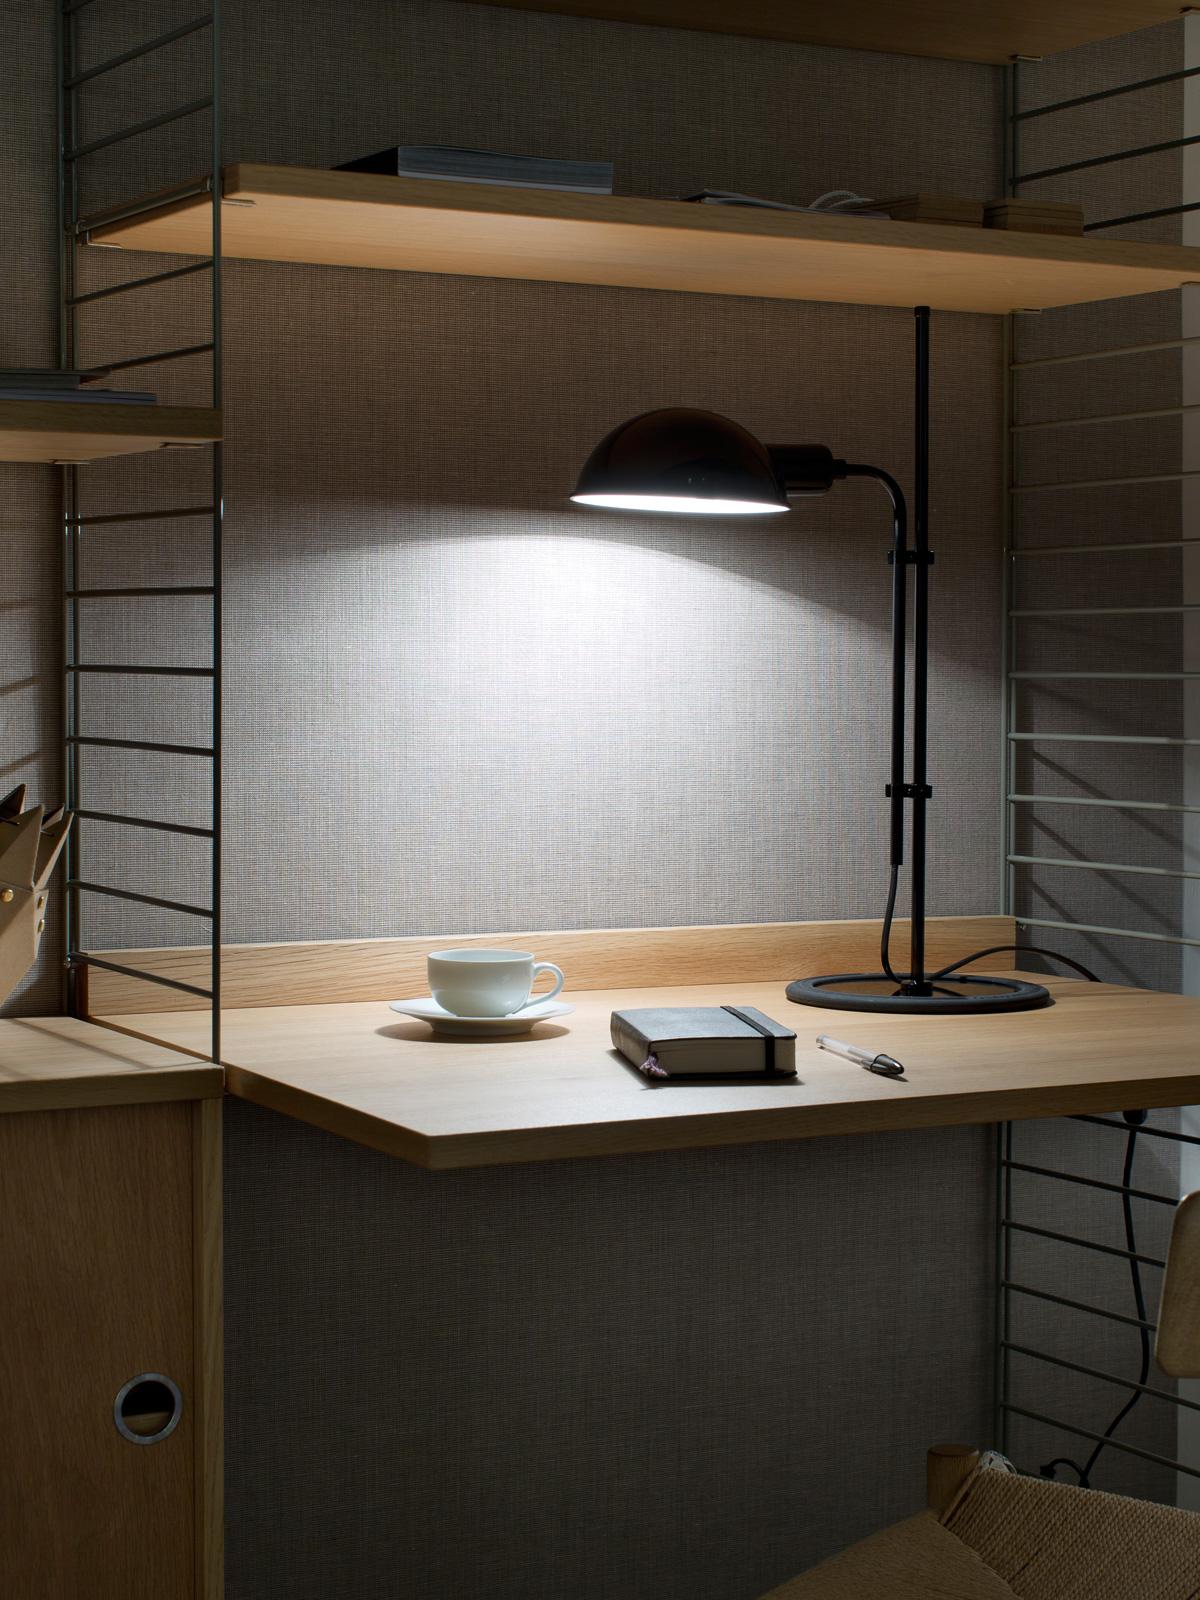 Funiculi S Marset DesignOrt Onlineshop Berlin Lampen Leuchten